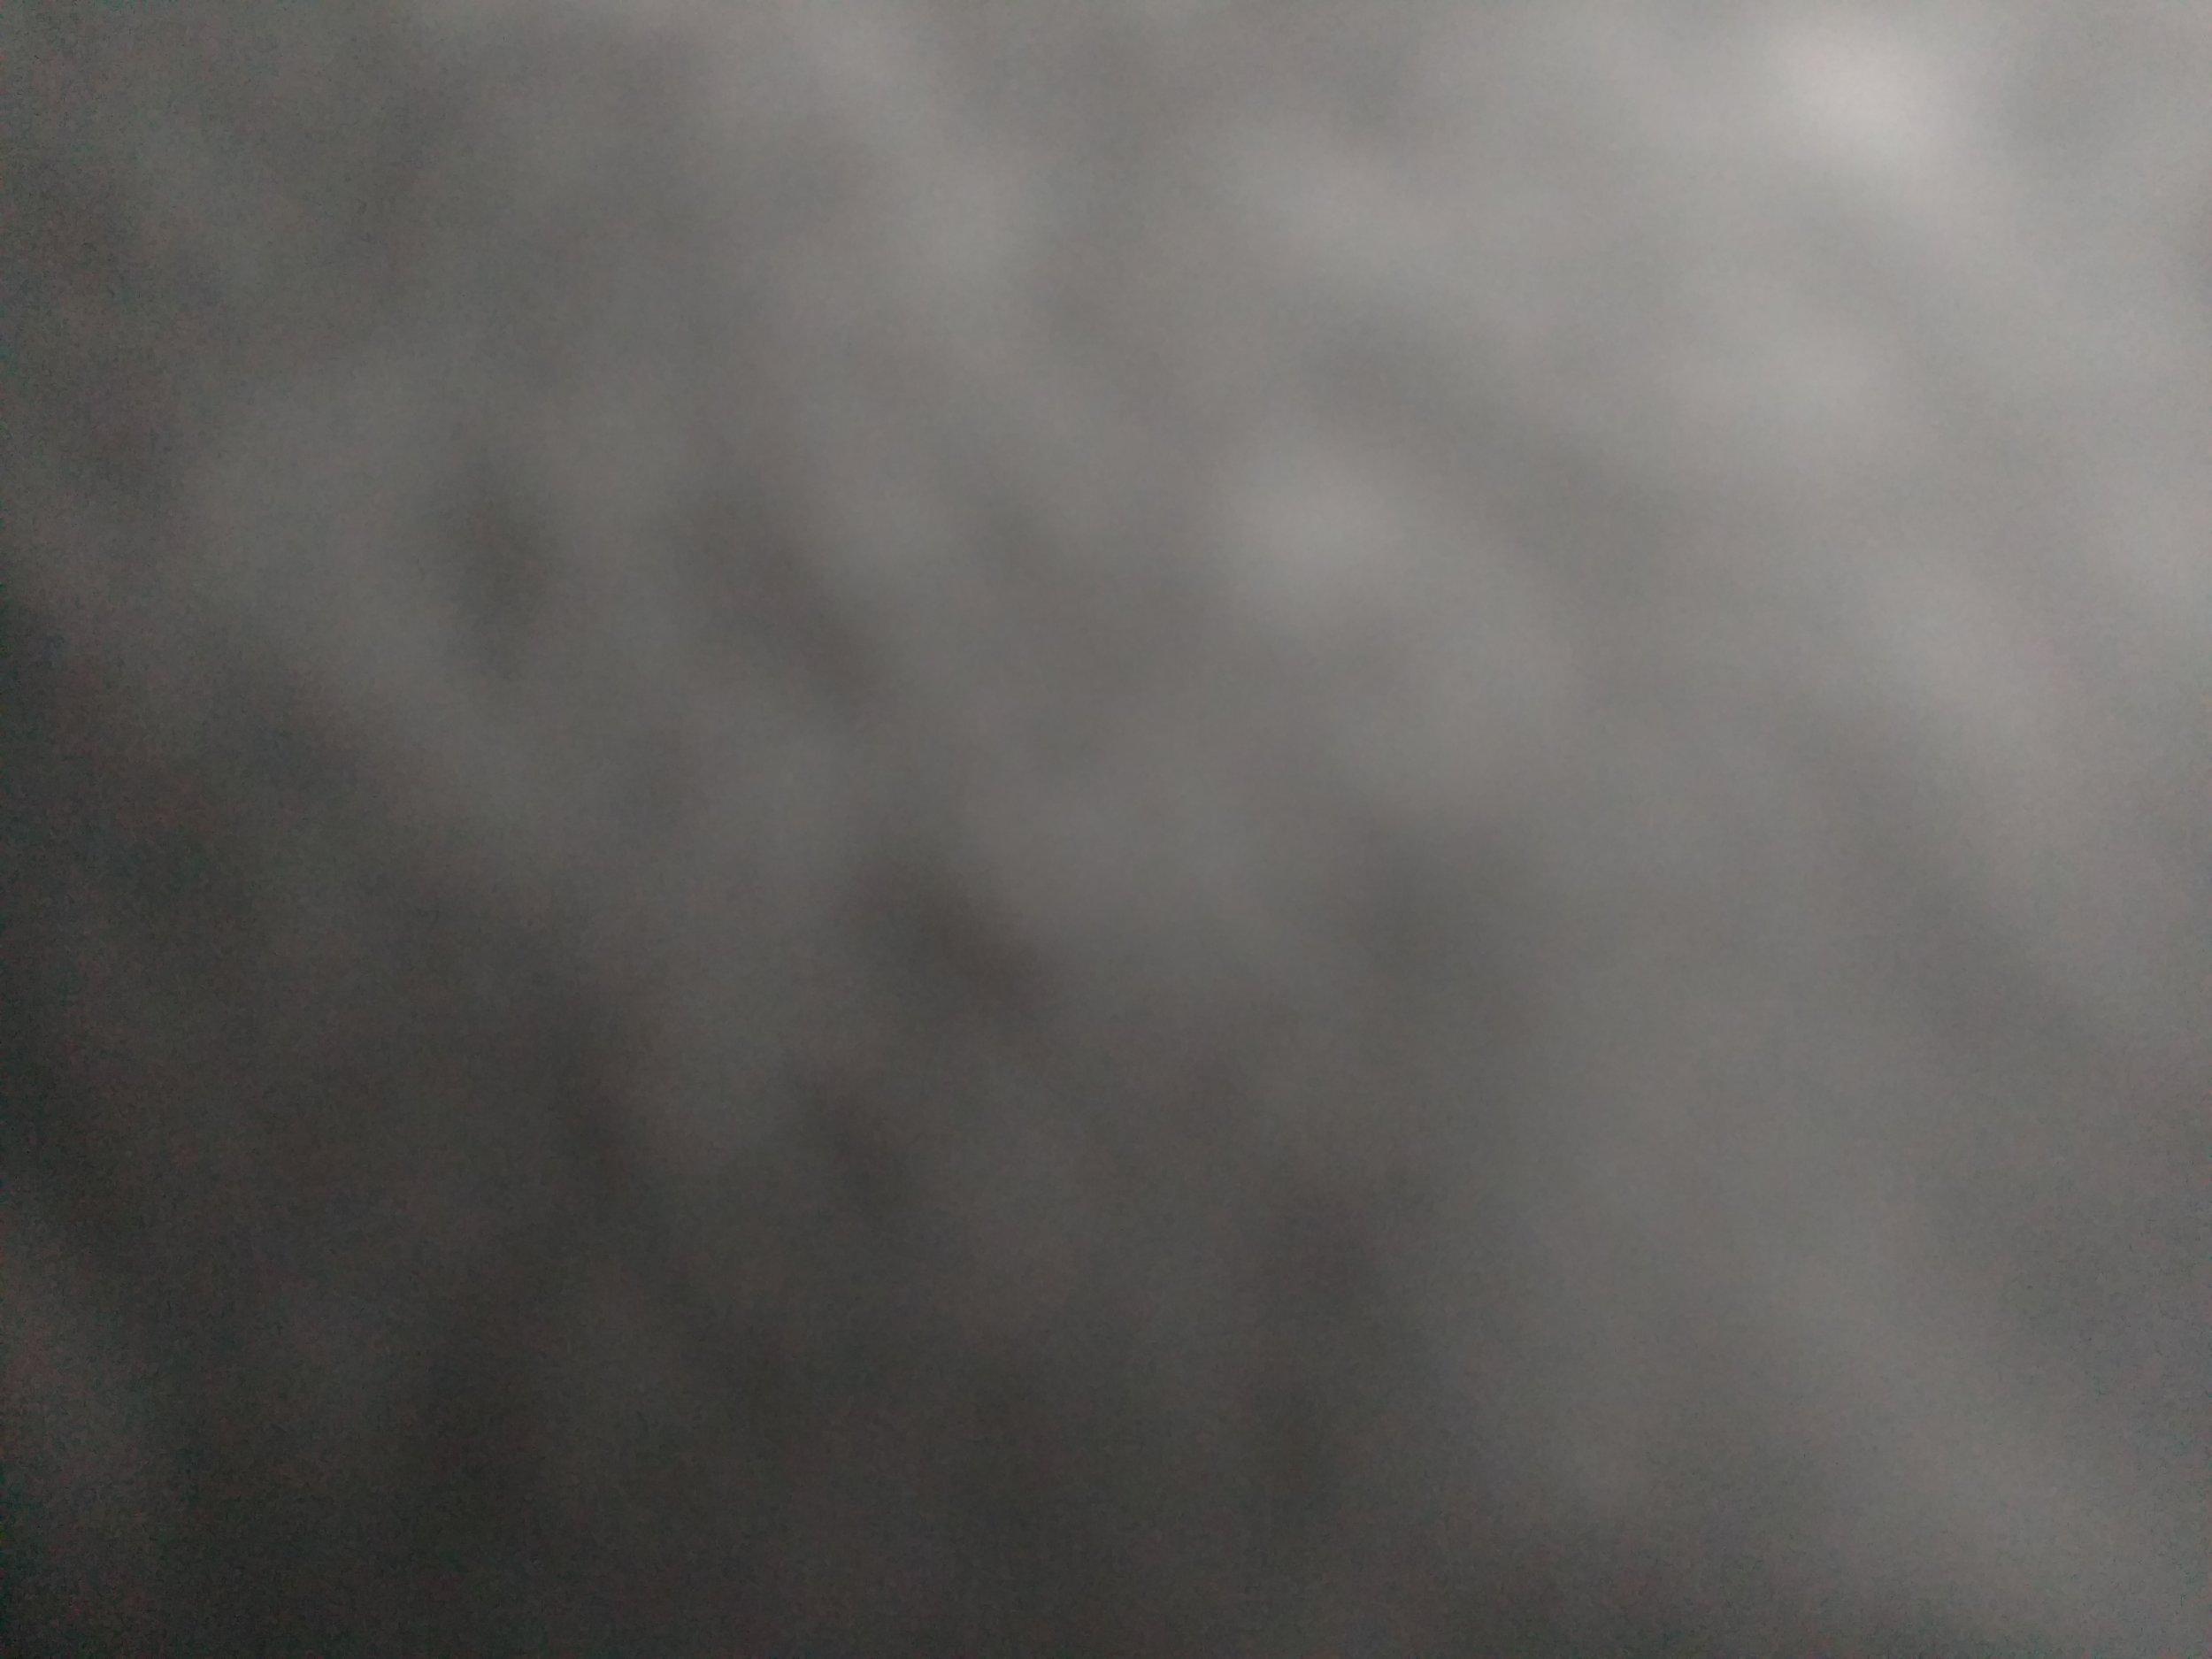 willroth-co-free-texture-gradient-027.jpg